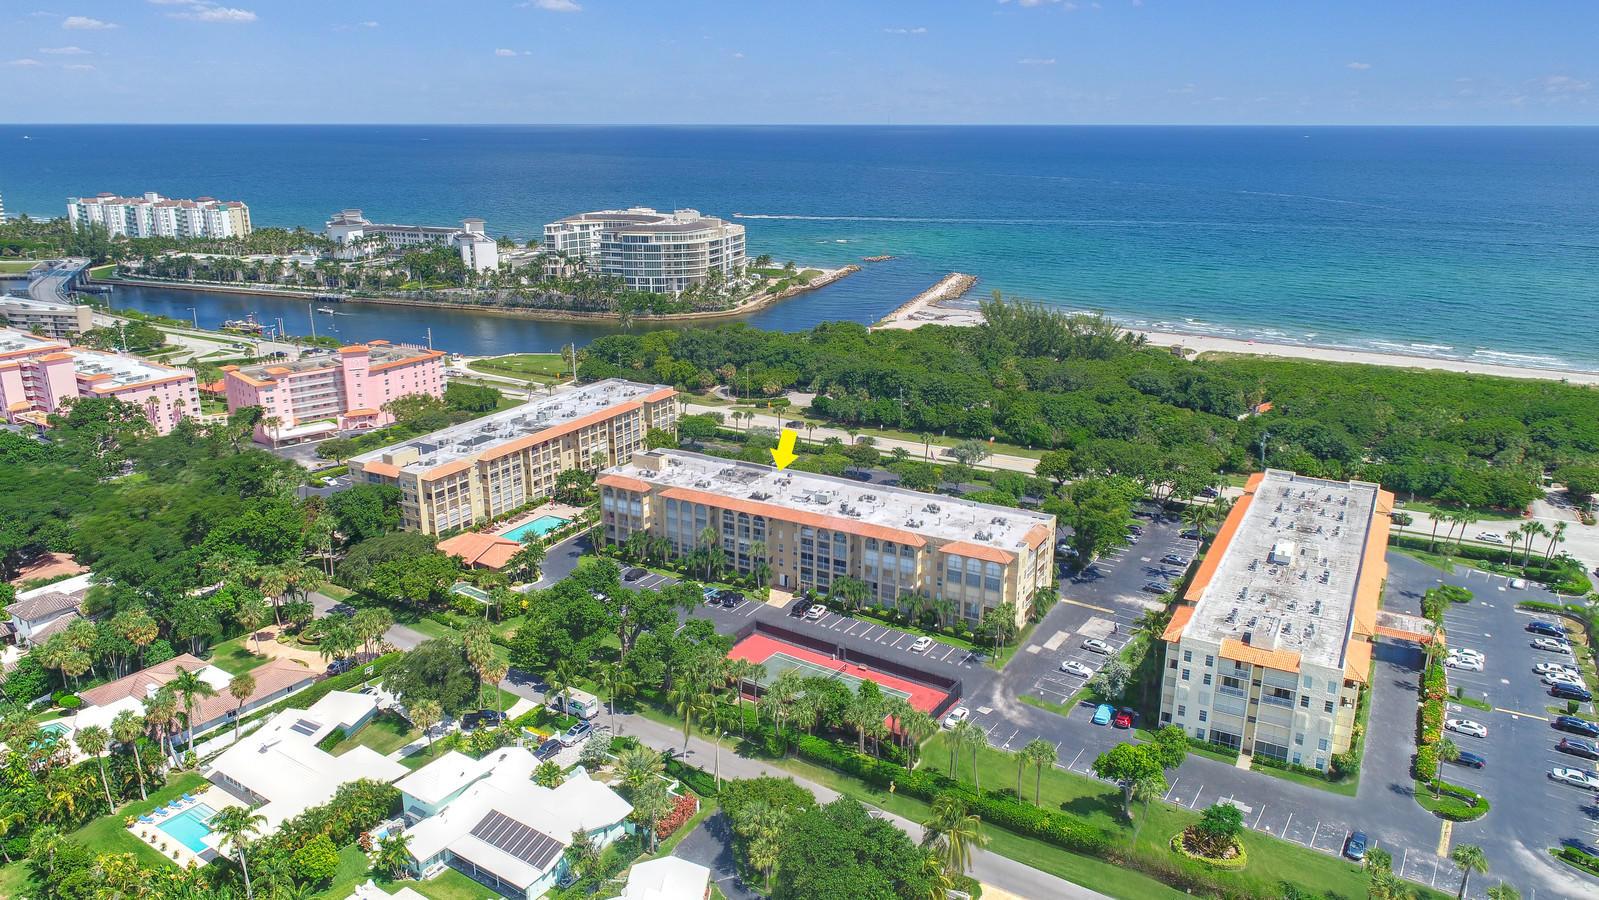 1111 S Ocean Boulevard #214 Boca Raton, FL 33432